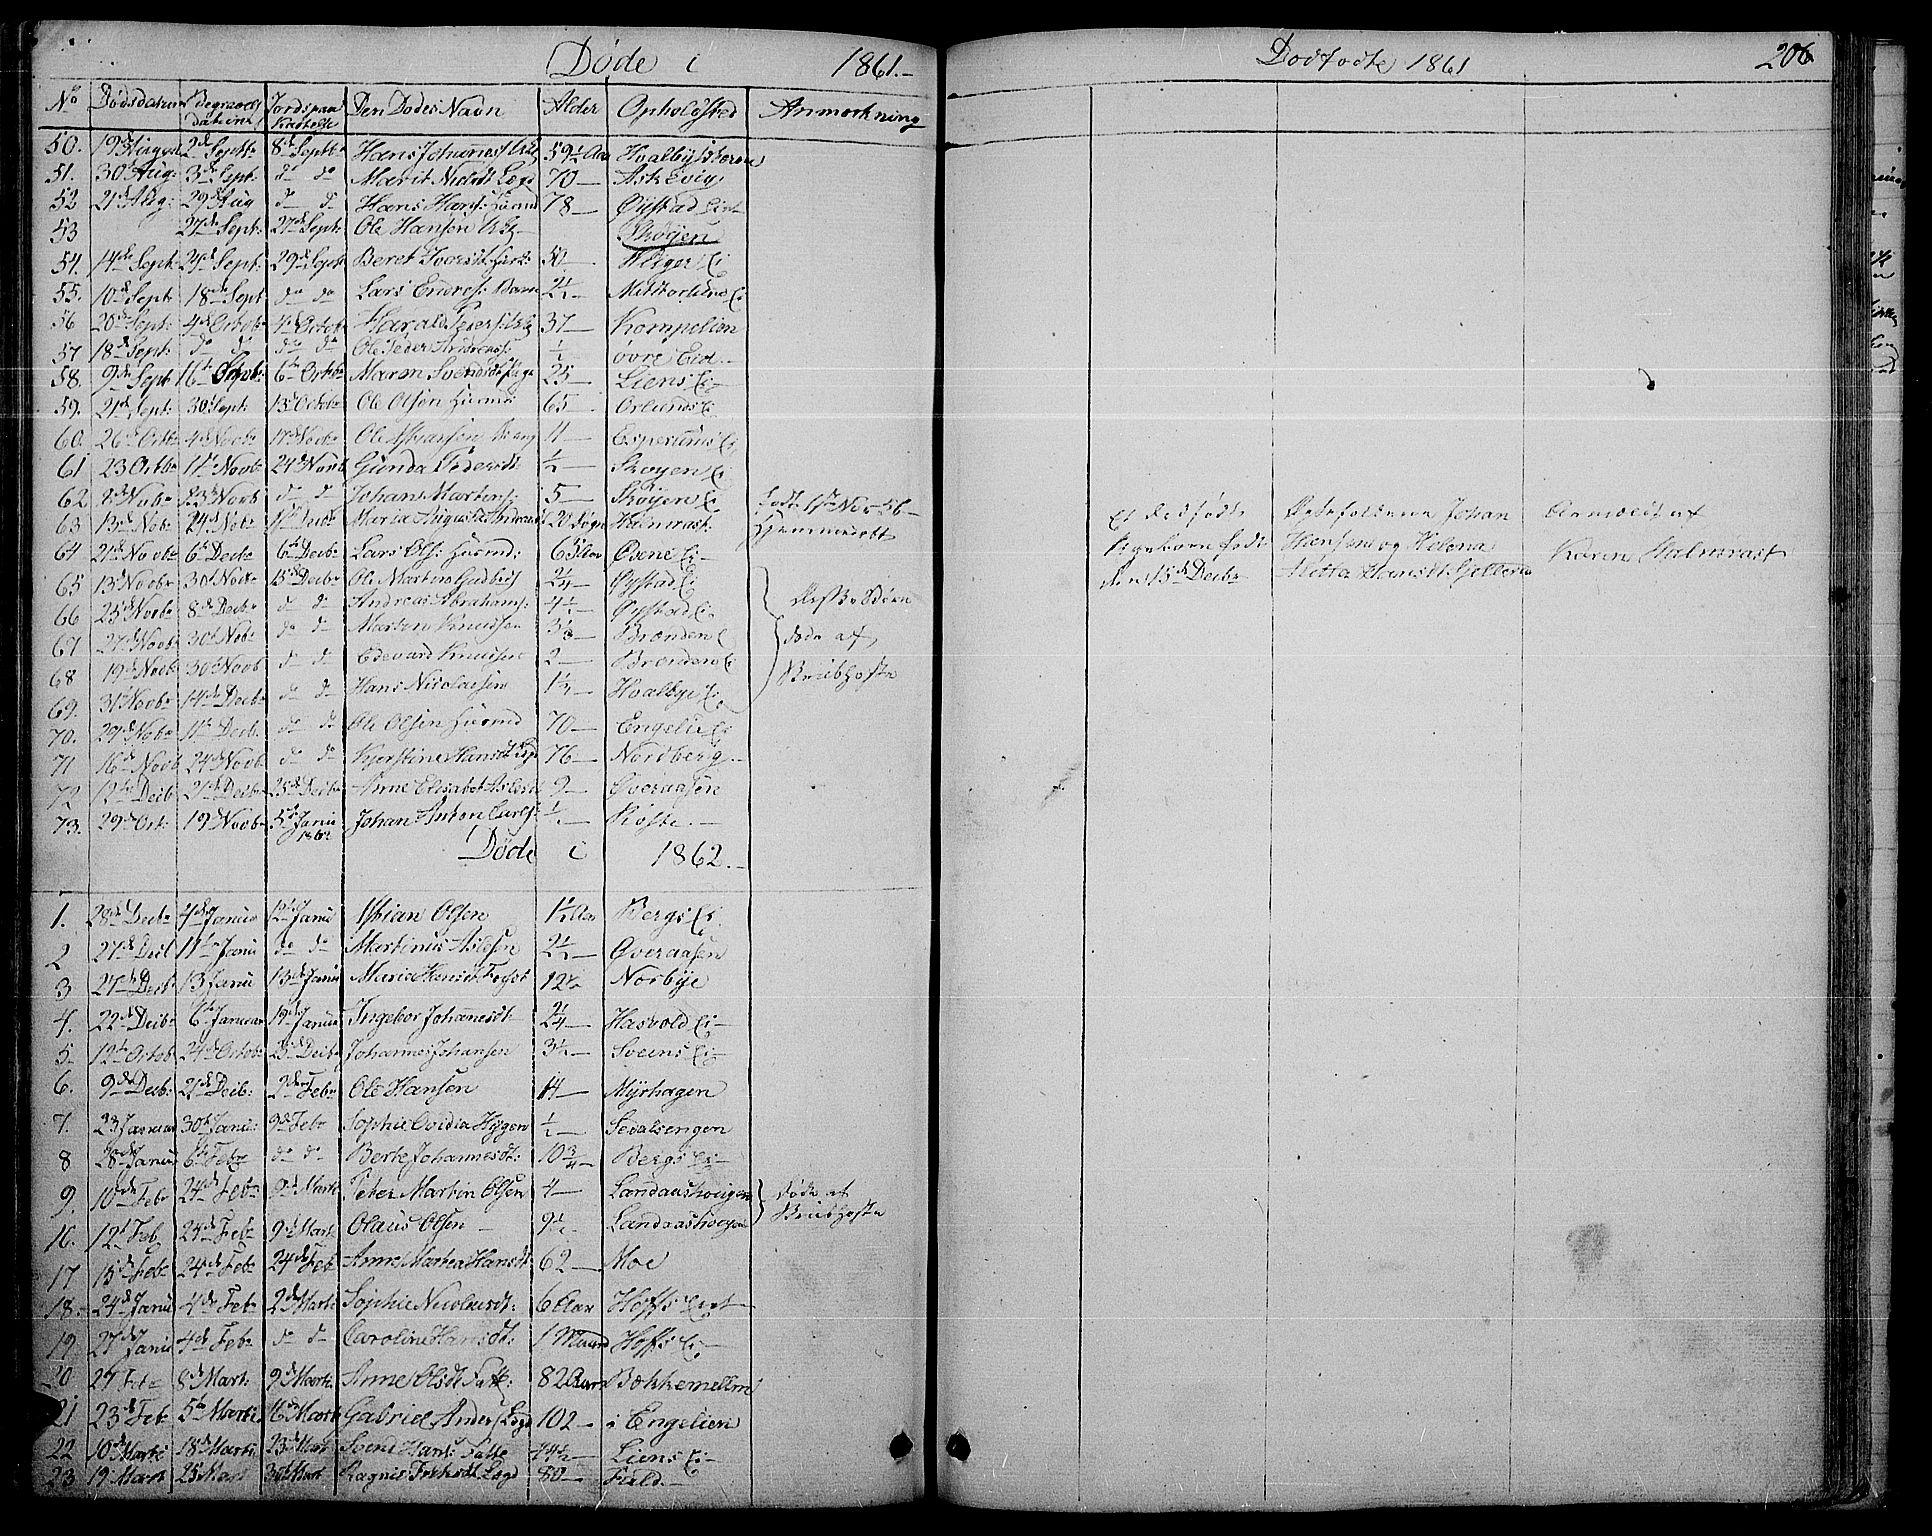 SAH, Søndre Land prestekontor, L/L0001: Klokkerbok nr. 1, 1849-1883, s. 206